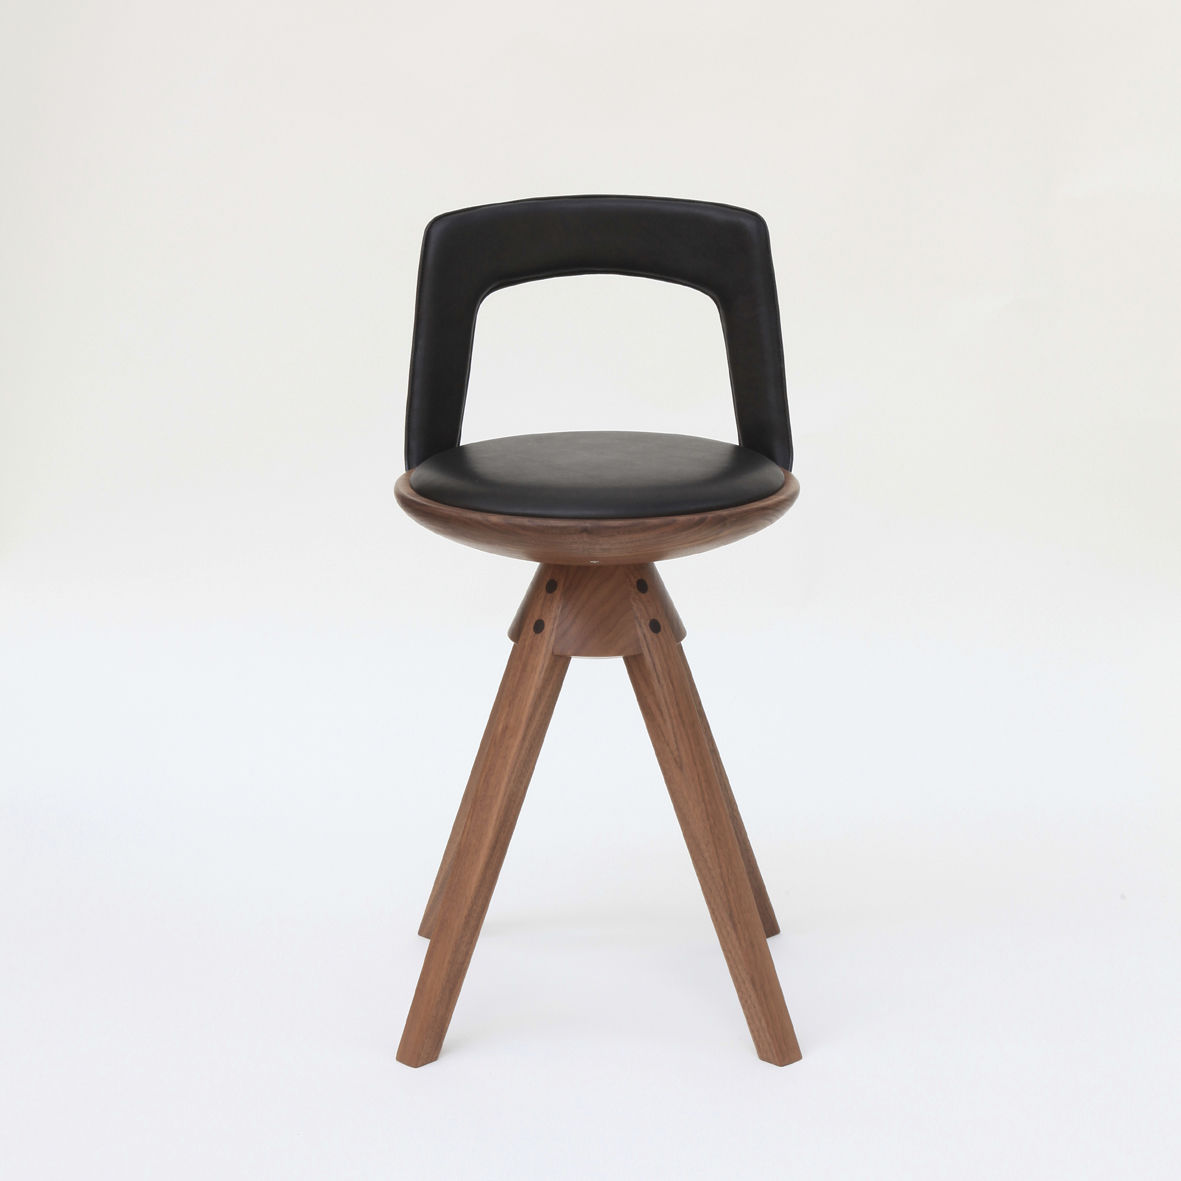 Chaise De Bar Design Scandinave Pivotante Tapissee En Noyer